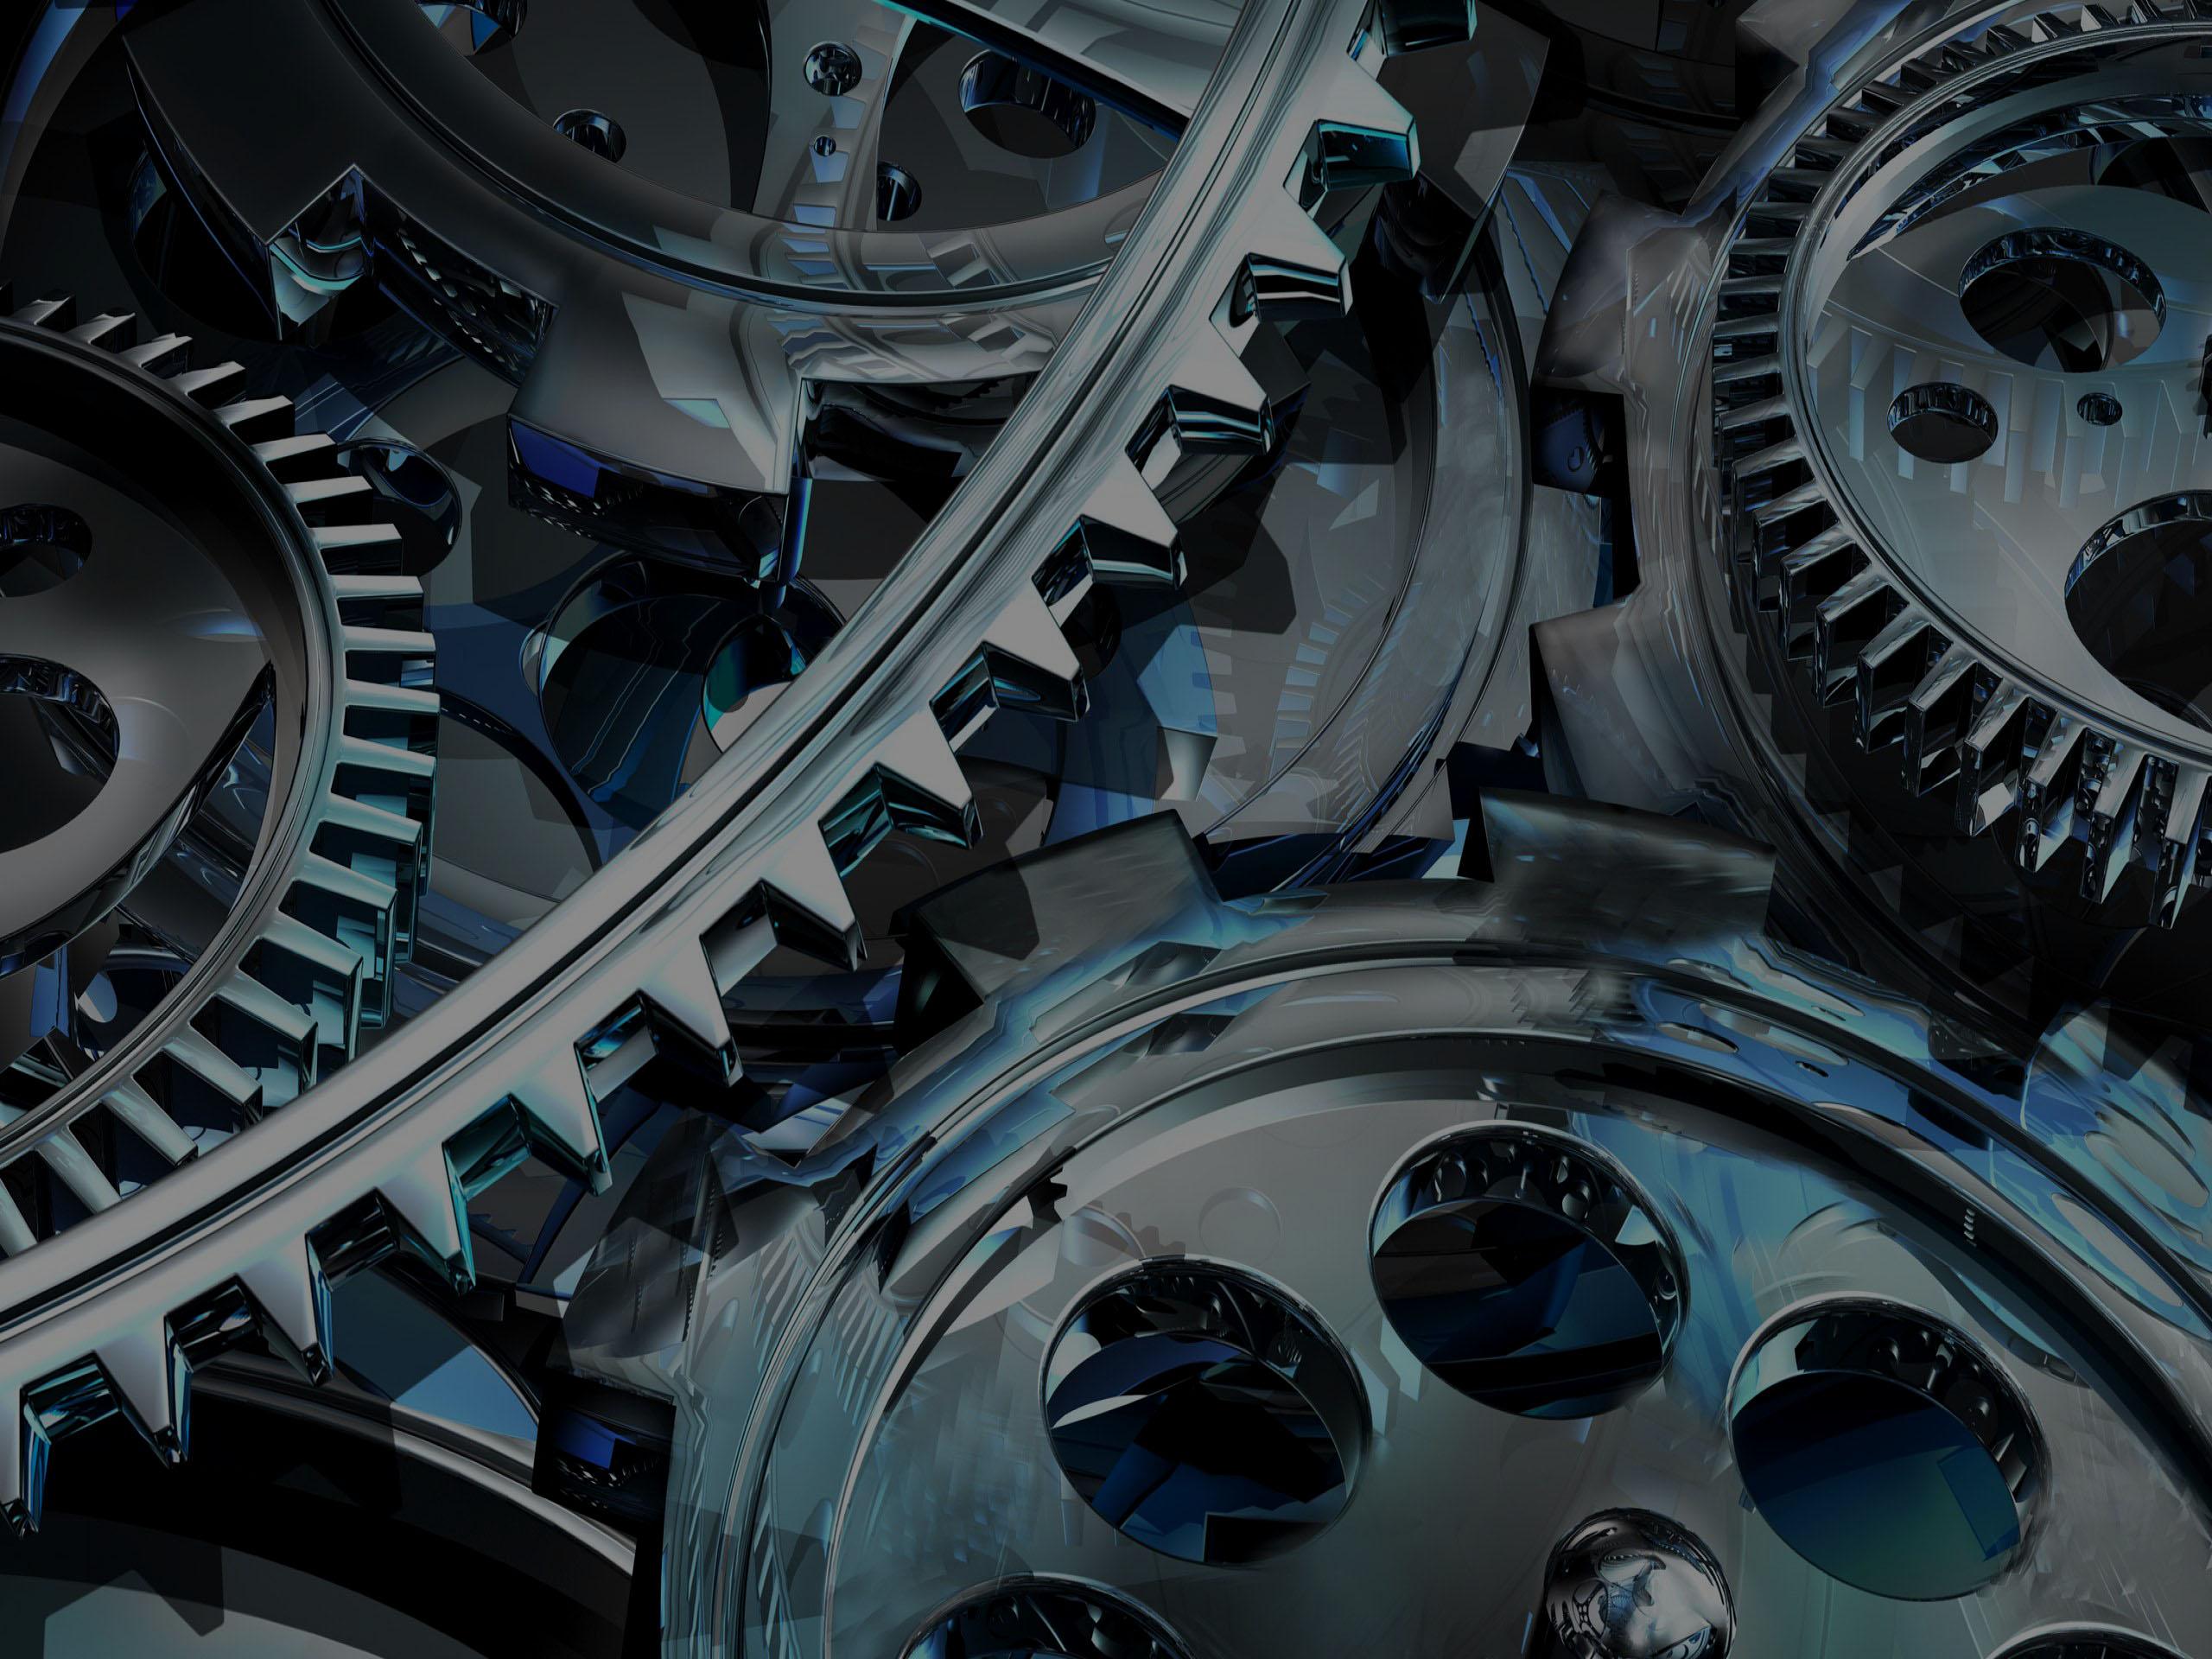 Wallpapers Mechanical Engineering Design Free Large